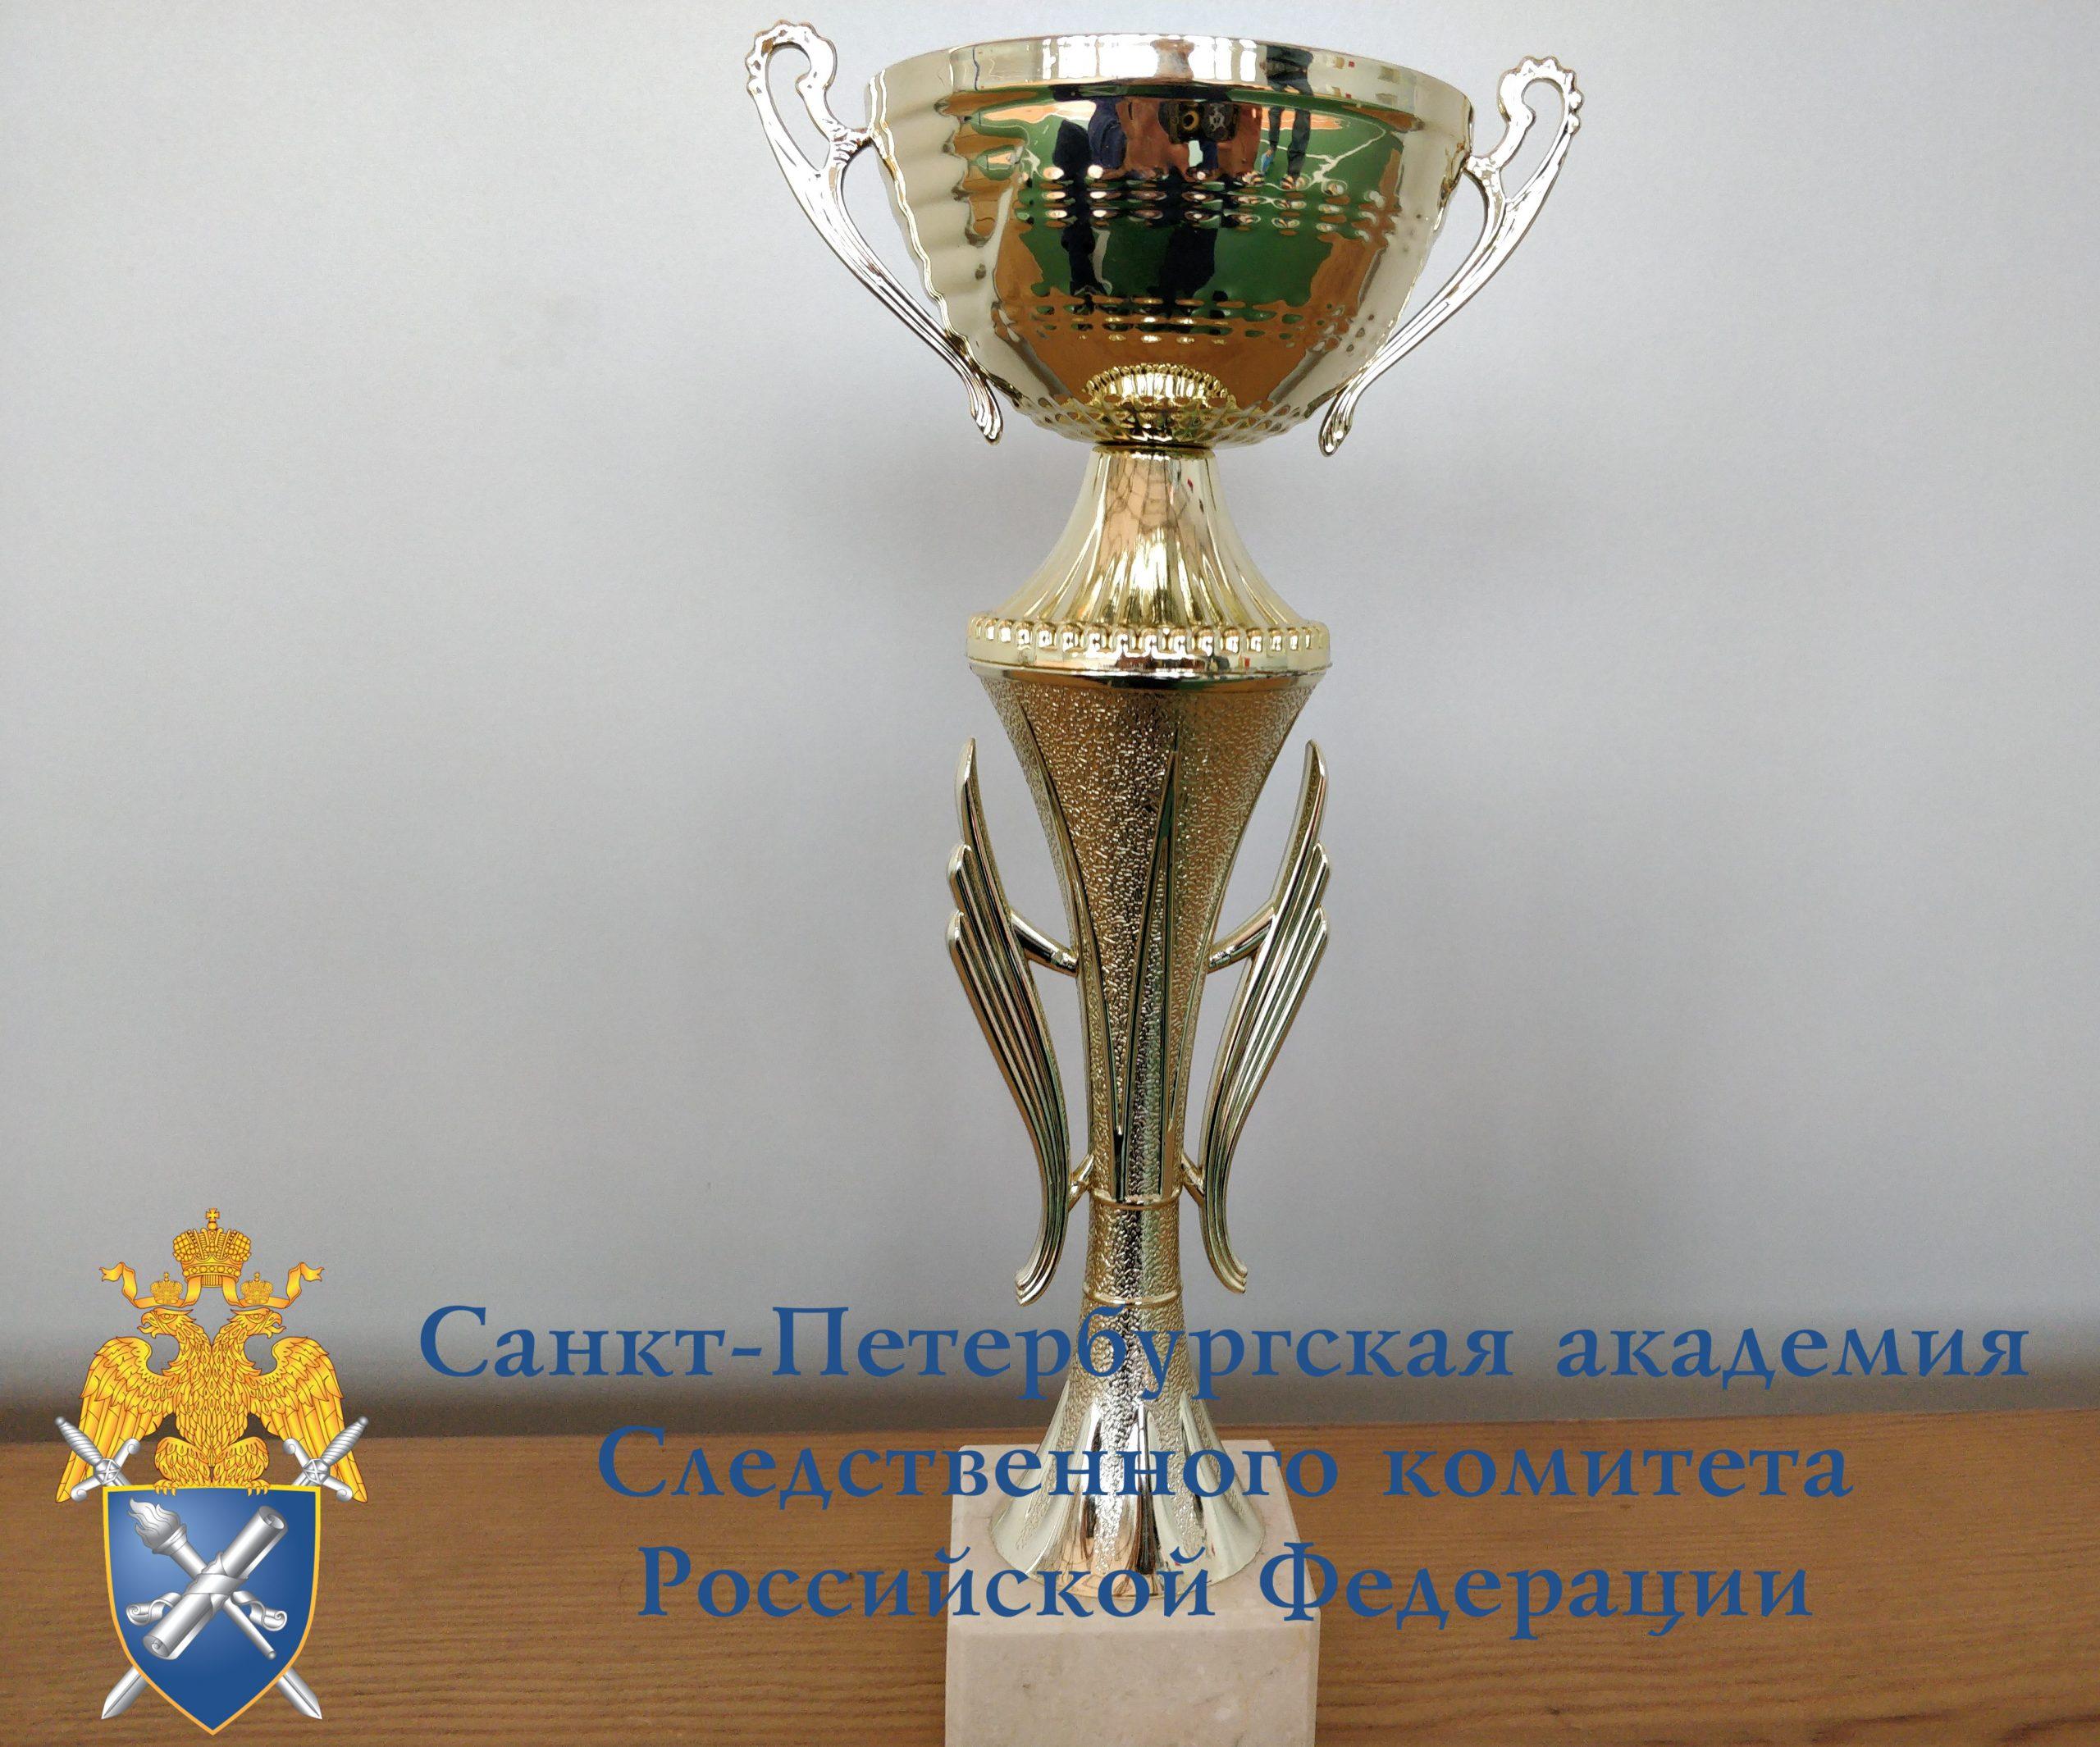 IMG_20211015_115449 (1)